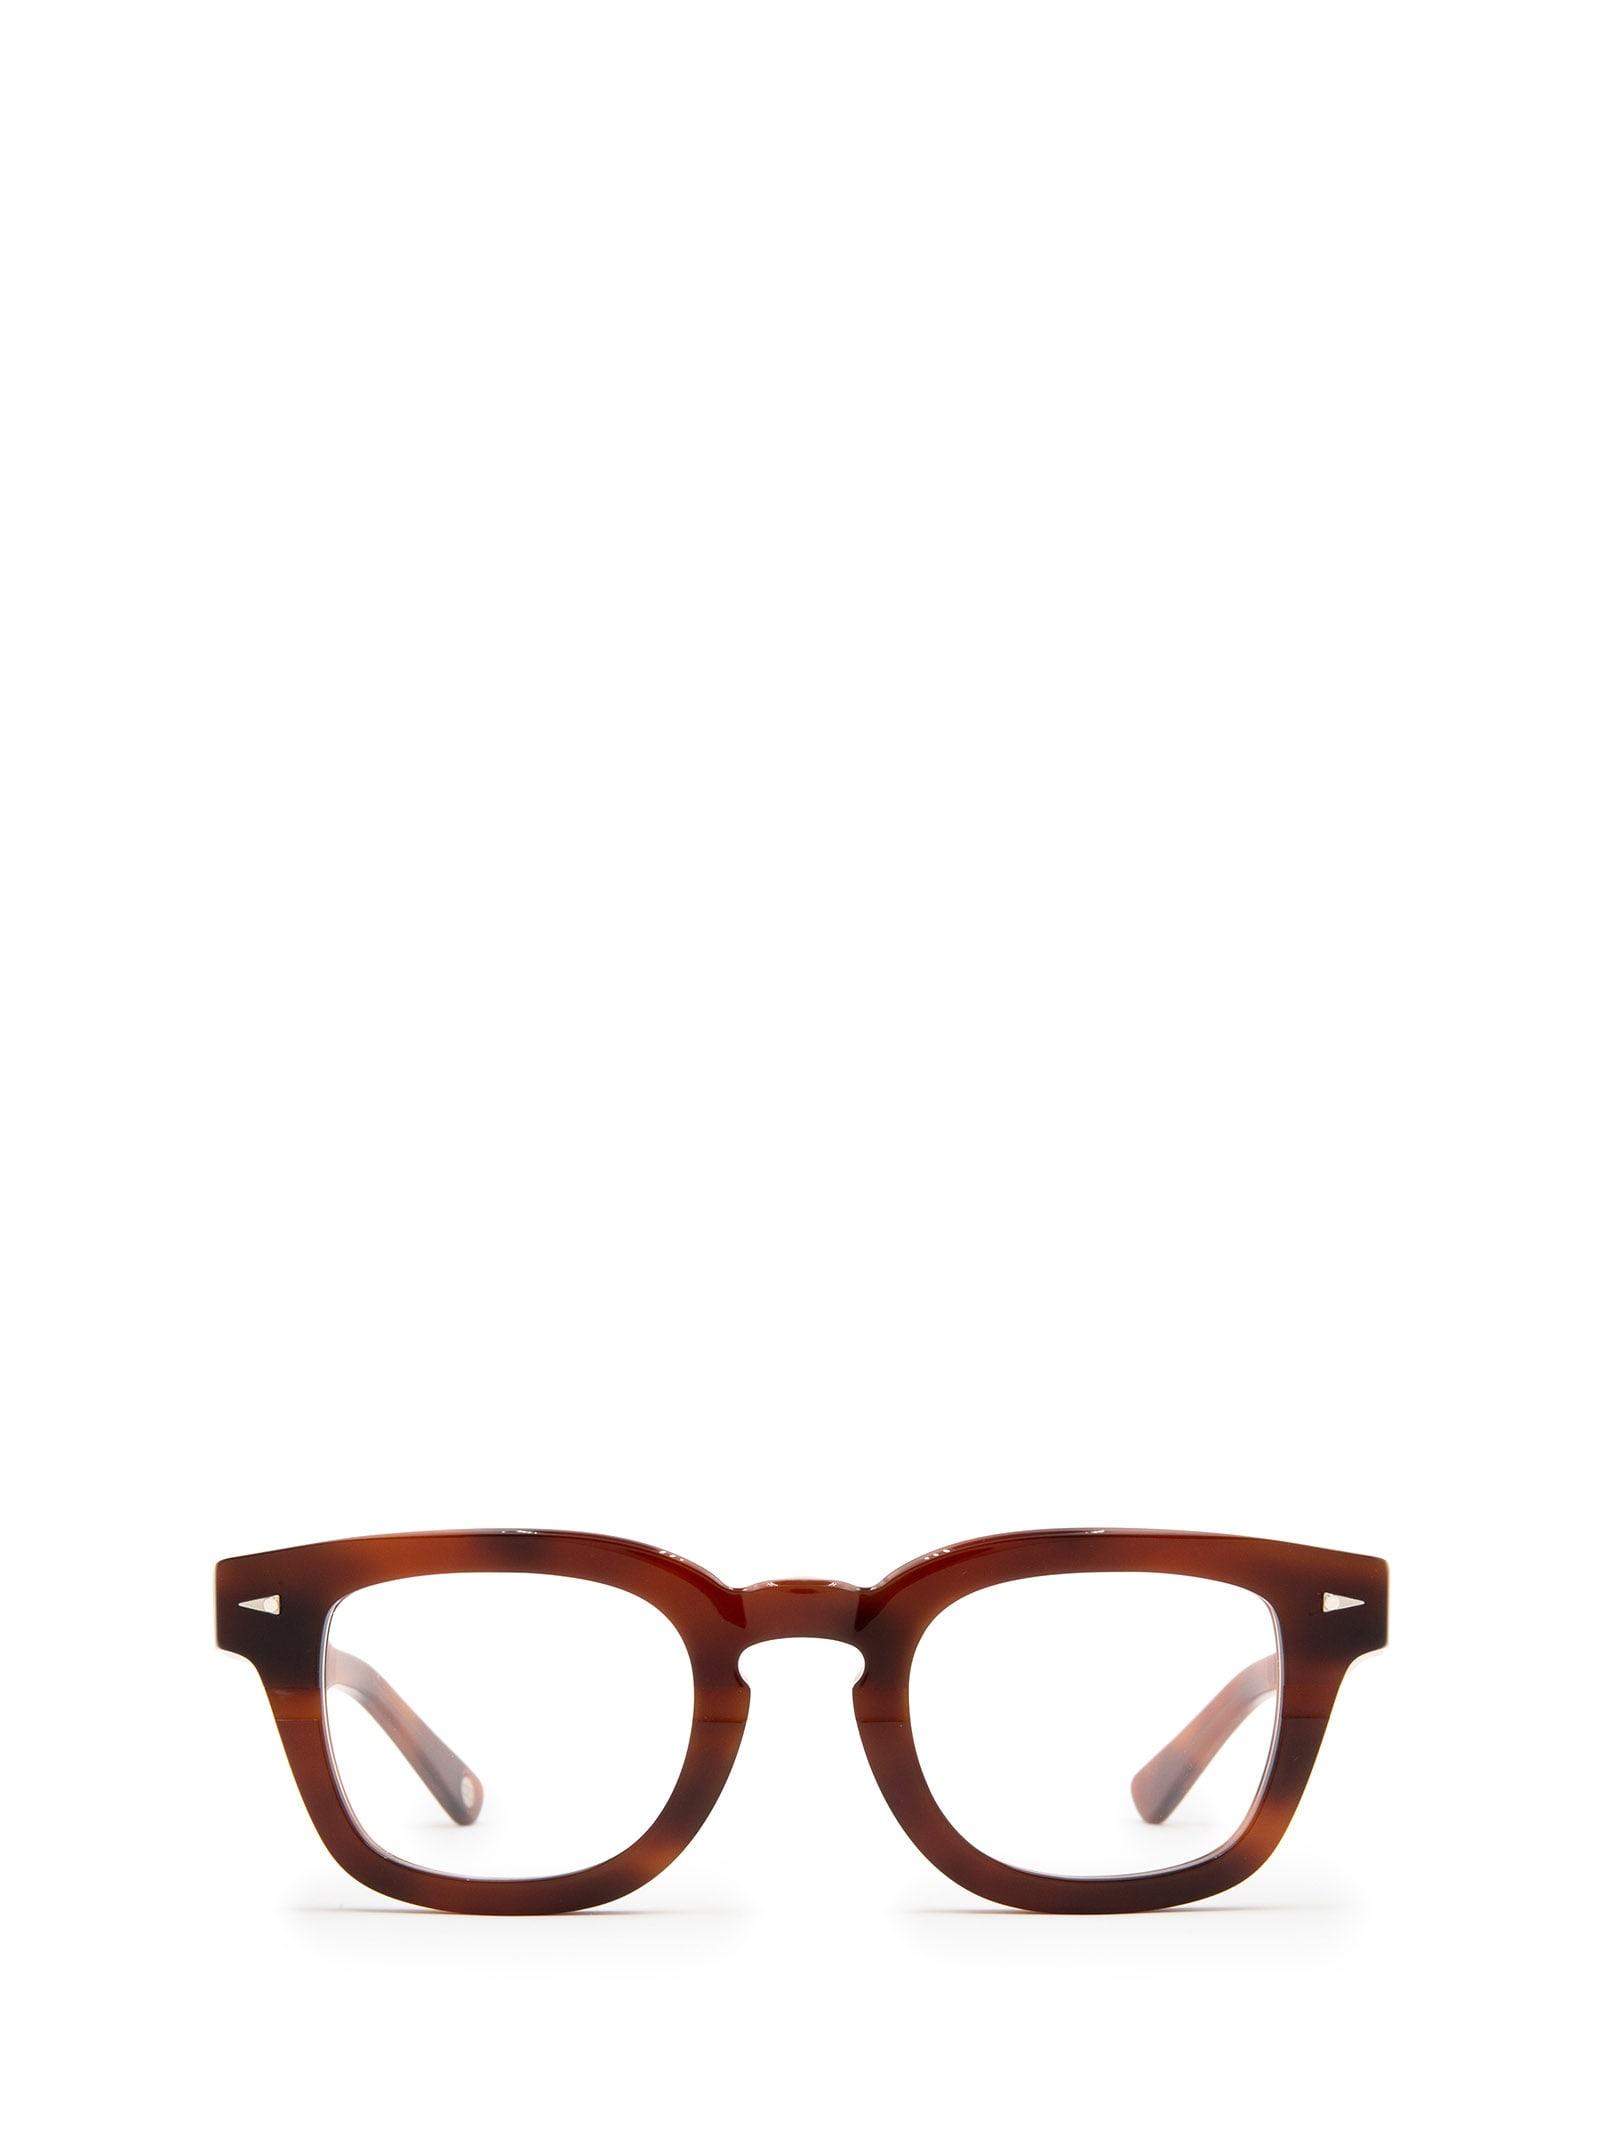 AHLEM Ahlem Champ De Mars Optic Brown Turtle Glasses